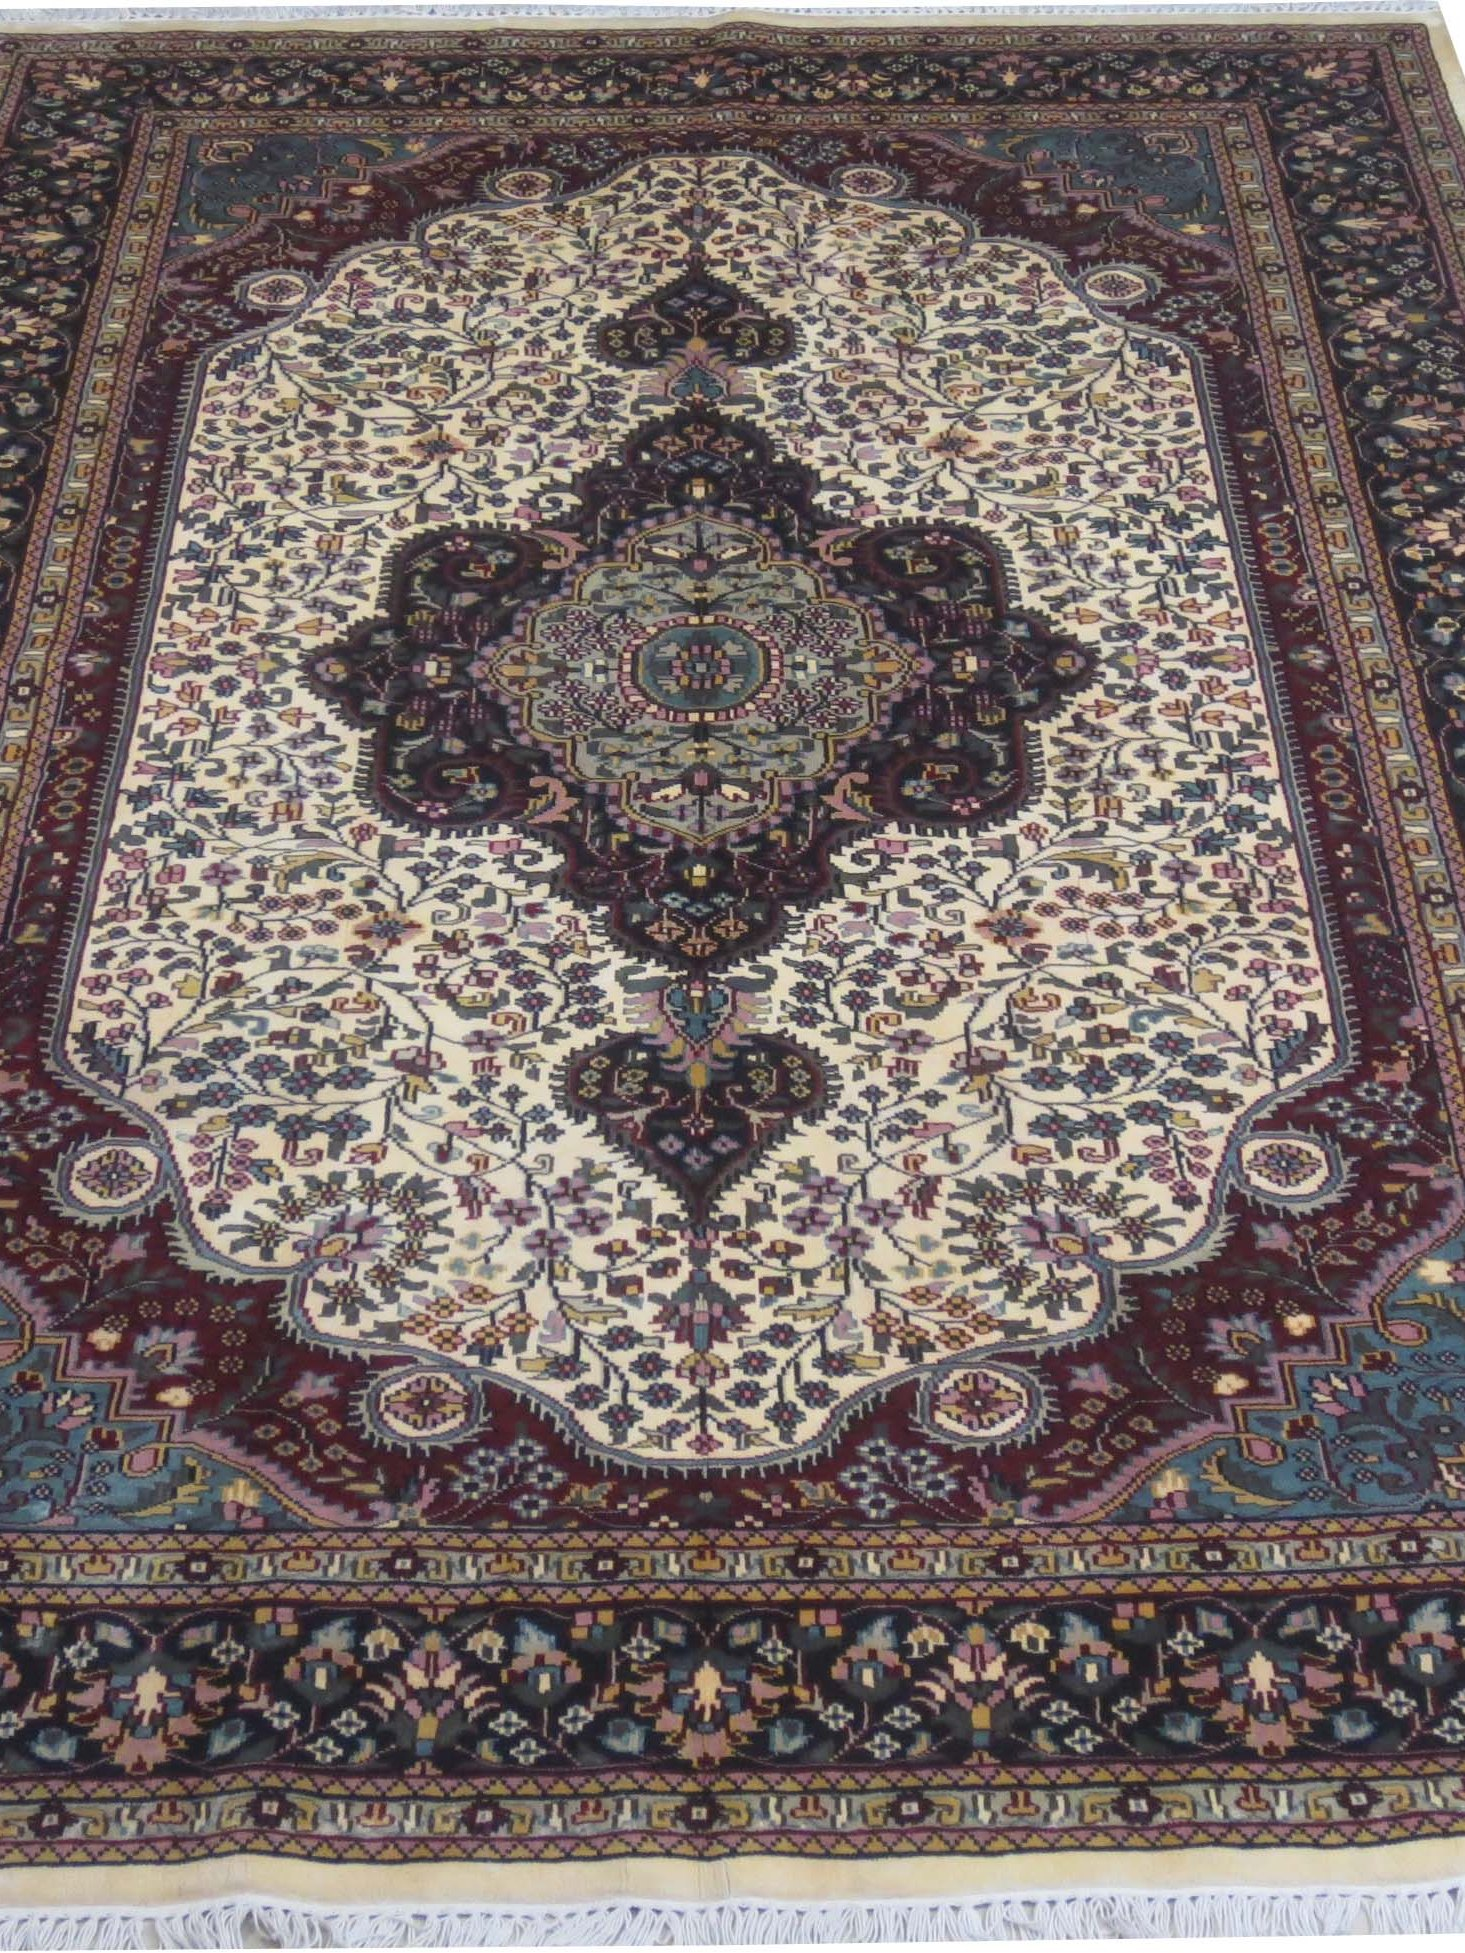 Ivory 6x9 Area Rugs Sale Silk Kashmir Cheap Rugs For Sale Handmade Oriental Rug  eBay